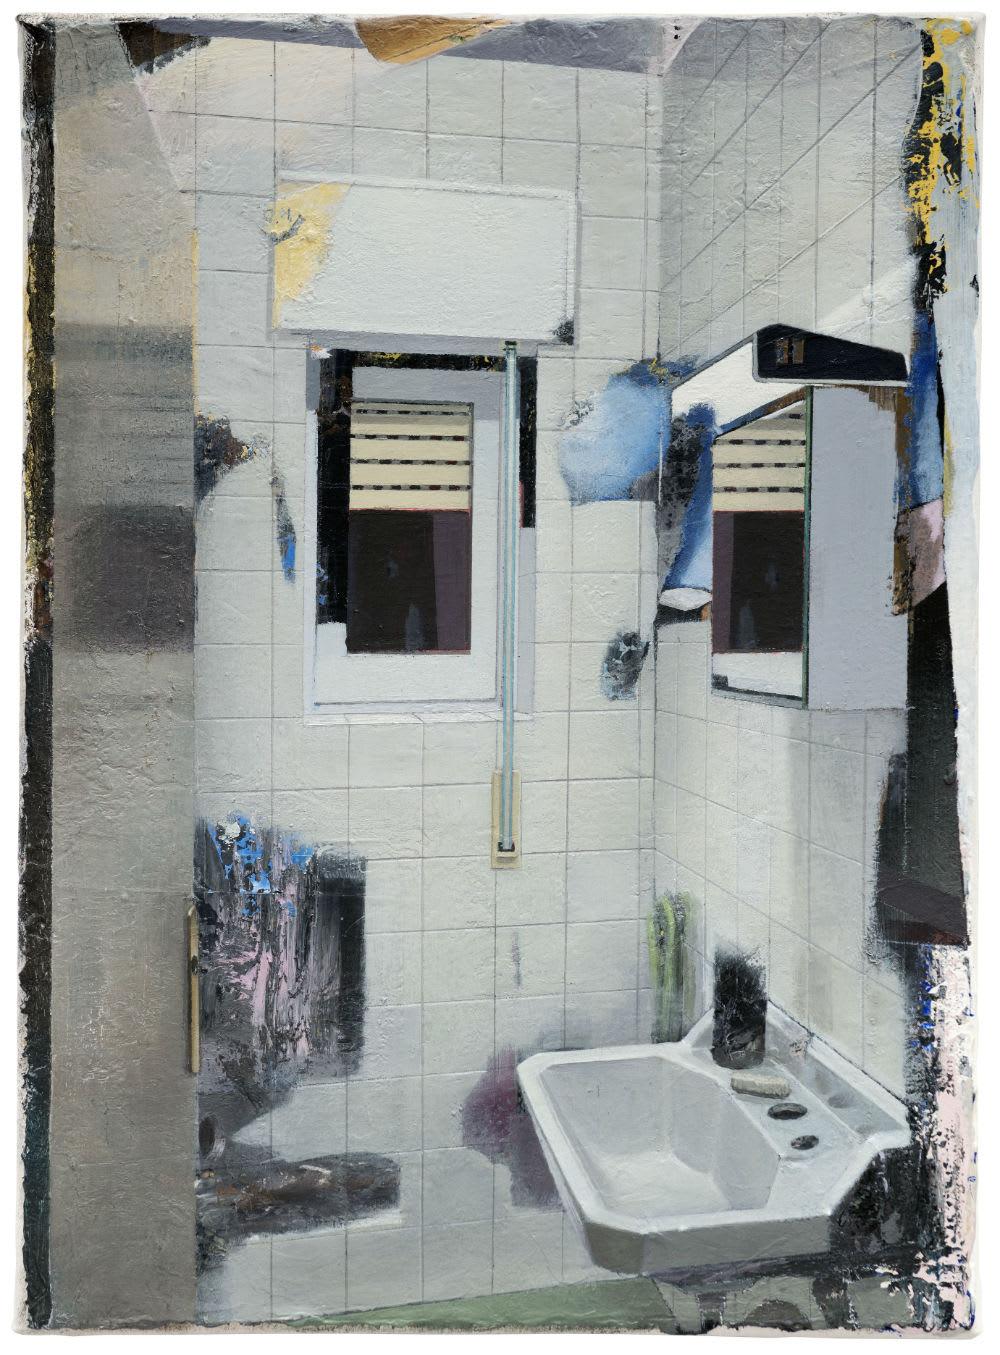 Carlos Sagrera Small Bathroom 2019 Rutger Brandt Gallery